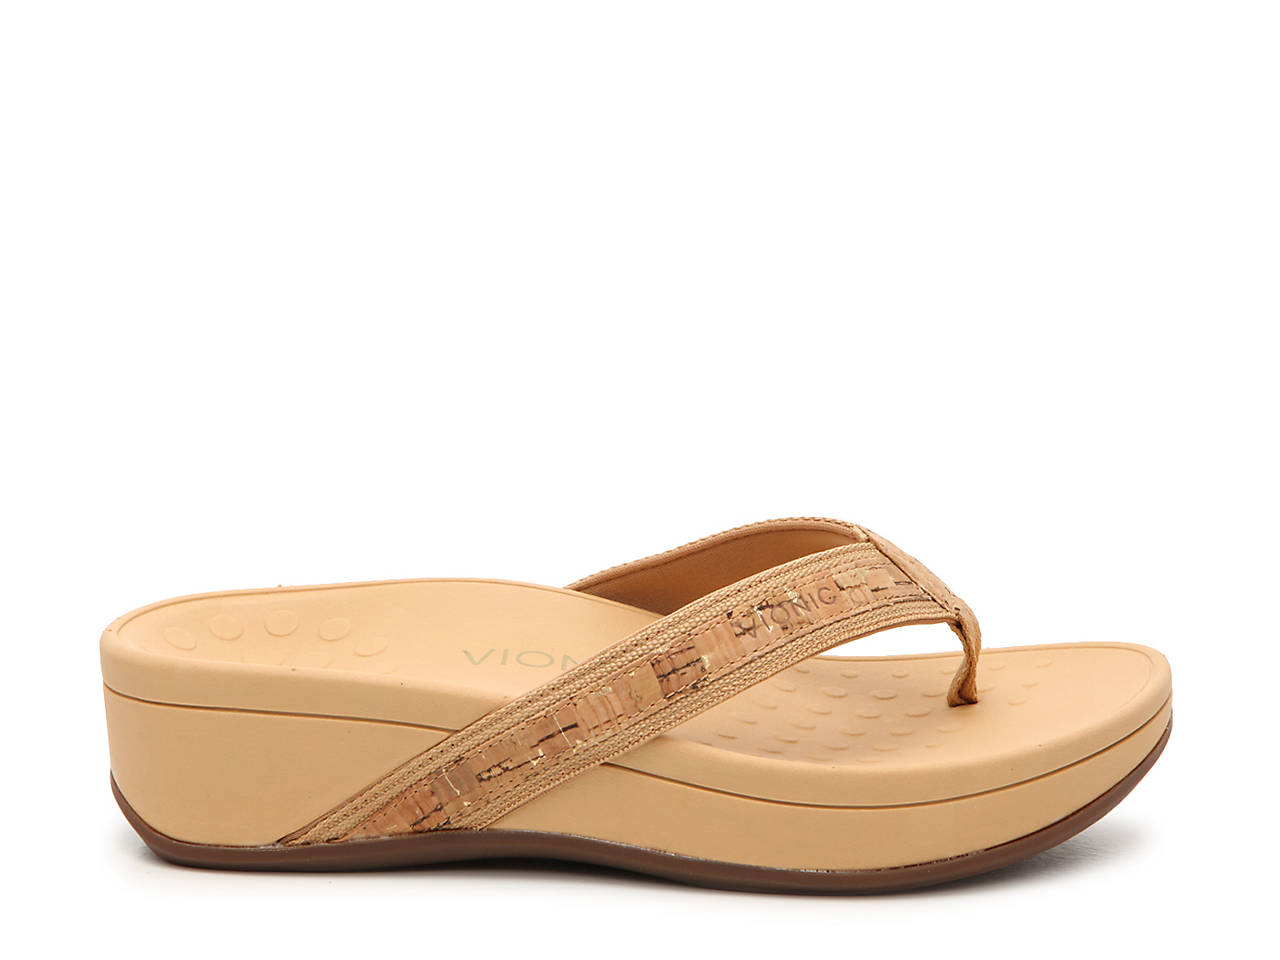 77210a551064 Vionic High Tide Wedge Sandal Women s Shoes